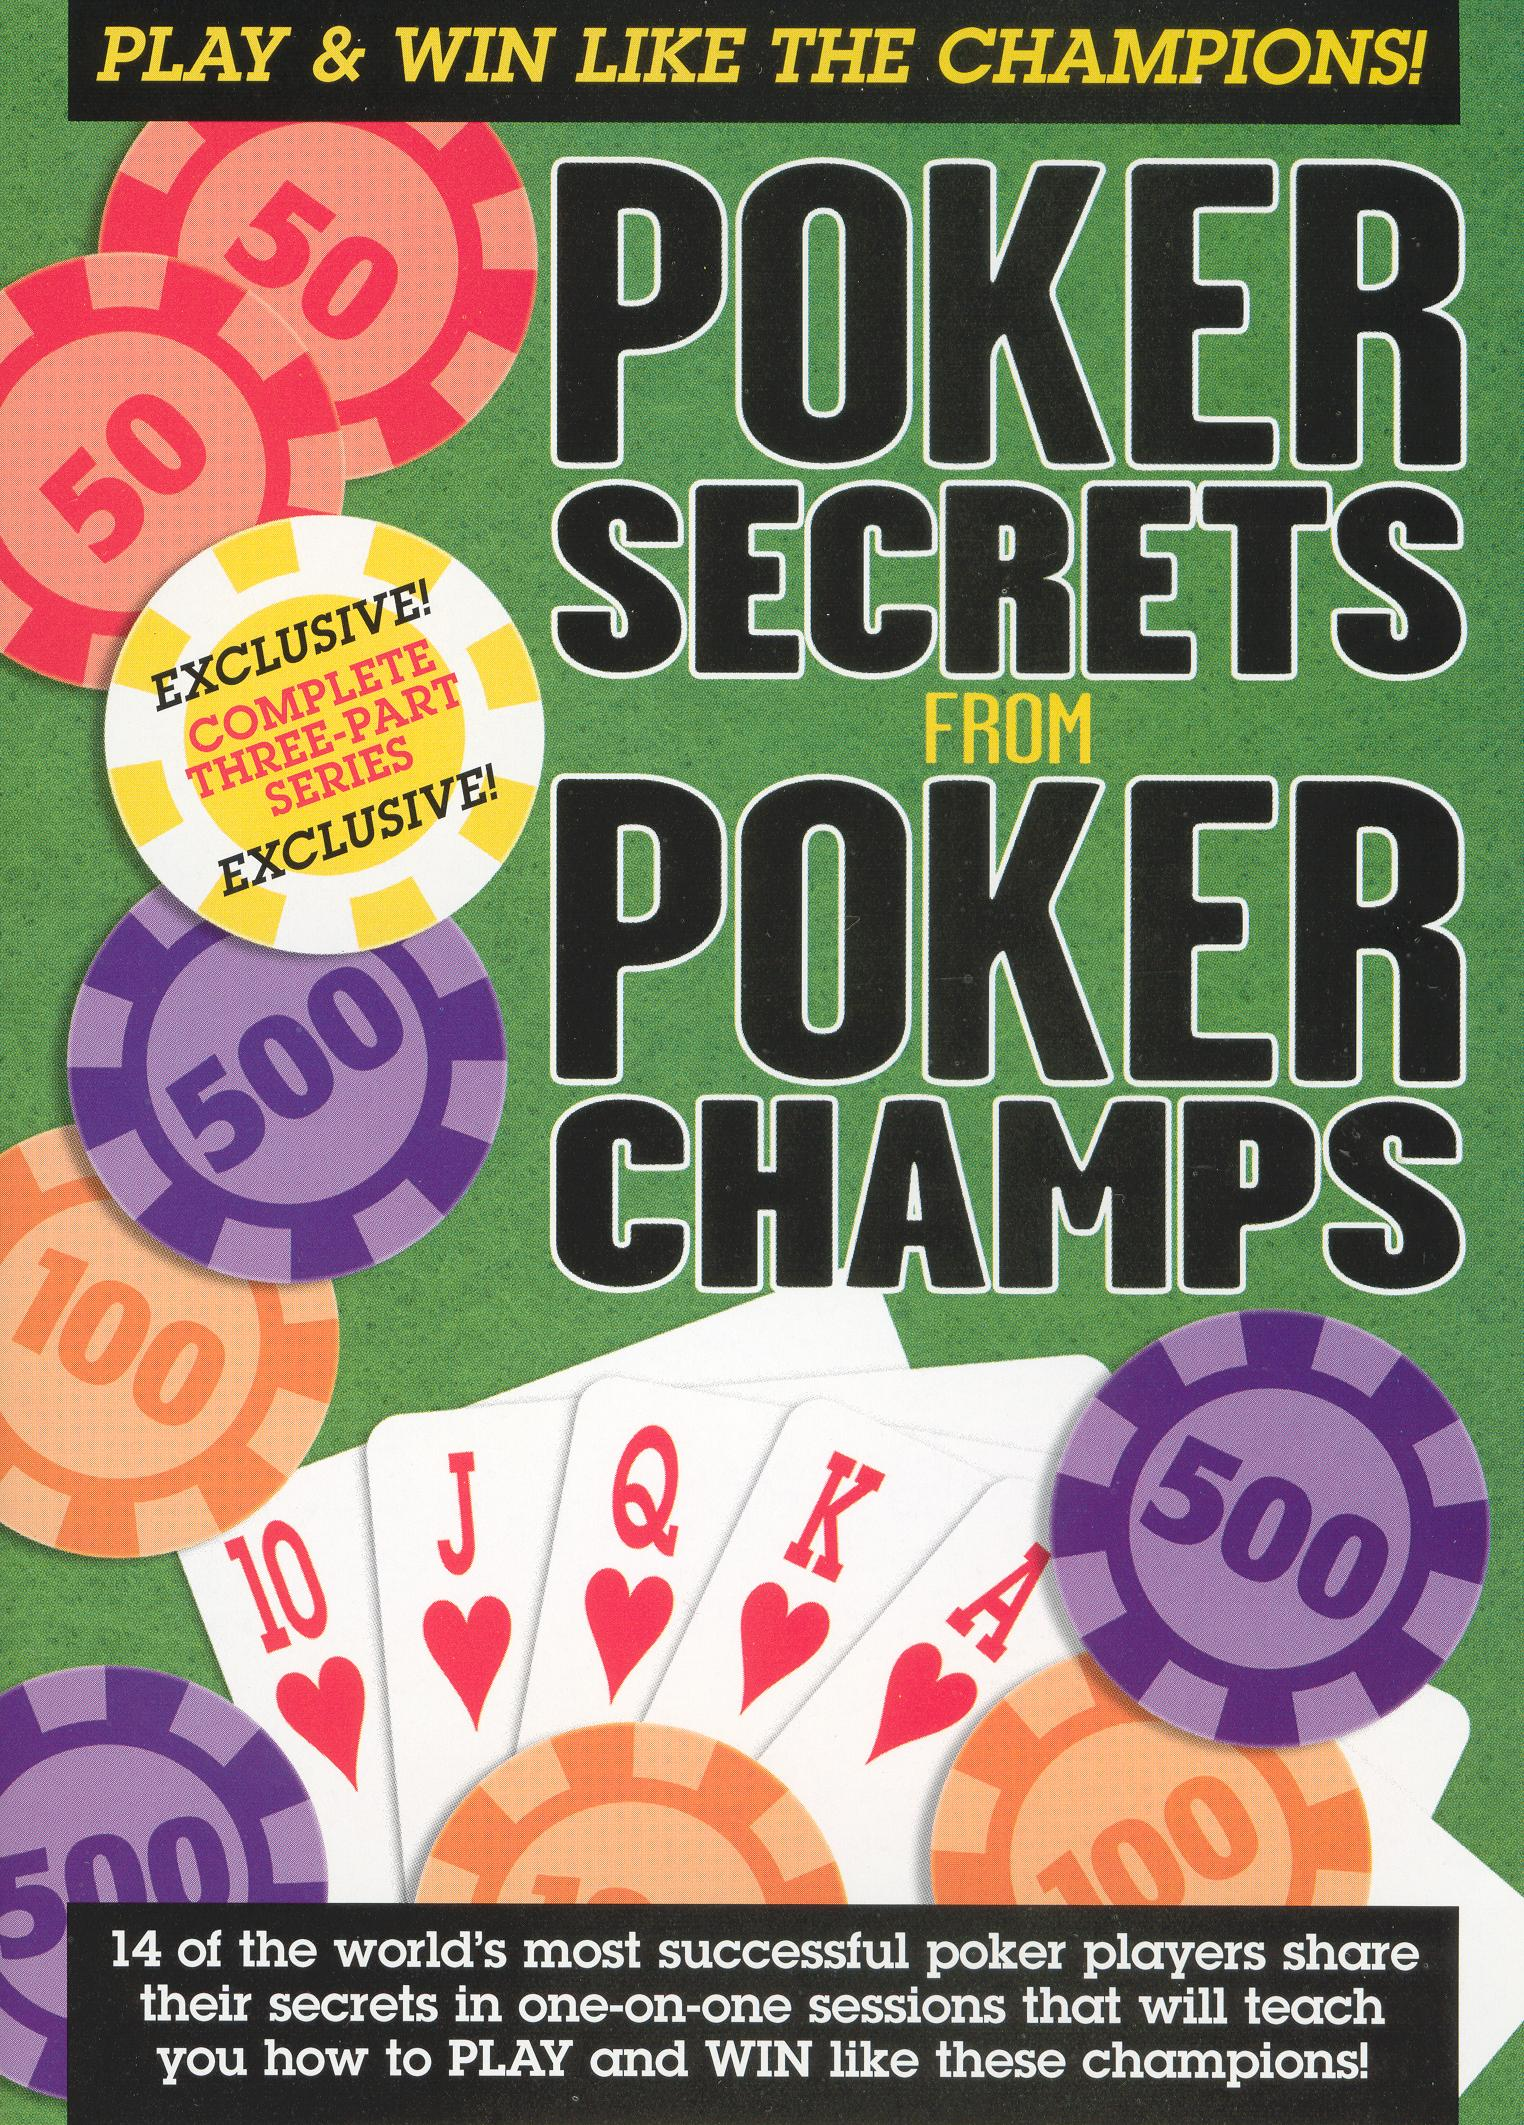 Poker Secrets From Poker Champs